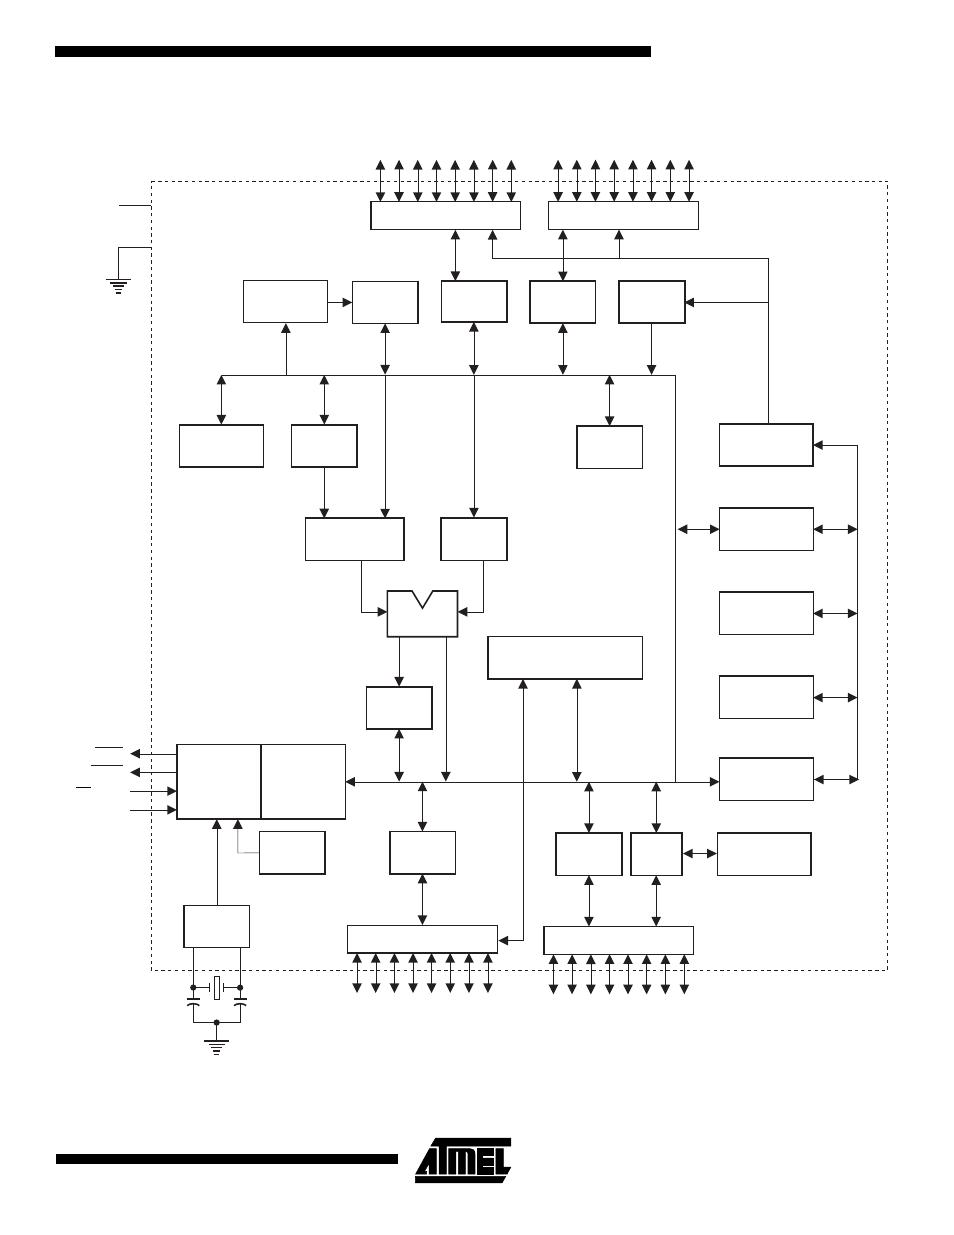 Block diagram at89s52 rainbow electronics at89s52 user manual block diagram at89s52 rainbow electronics at89s52 user manual page 3 30 ccuart Choice Image